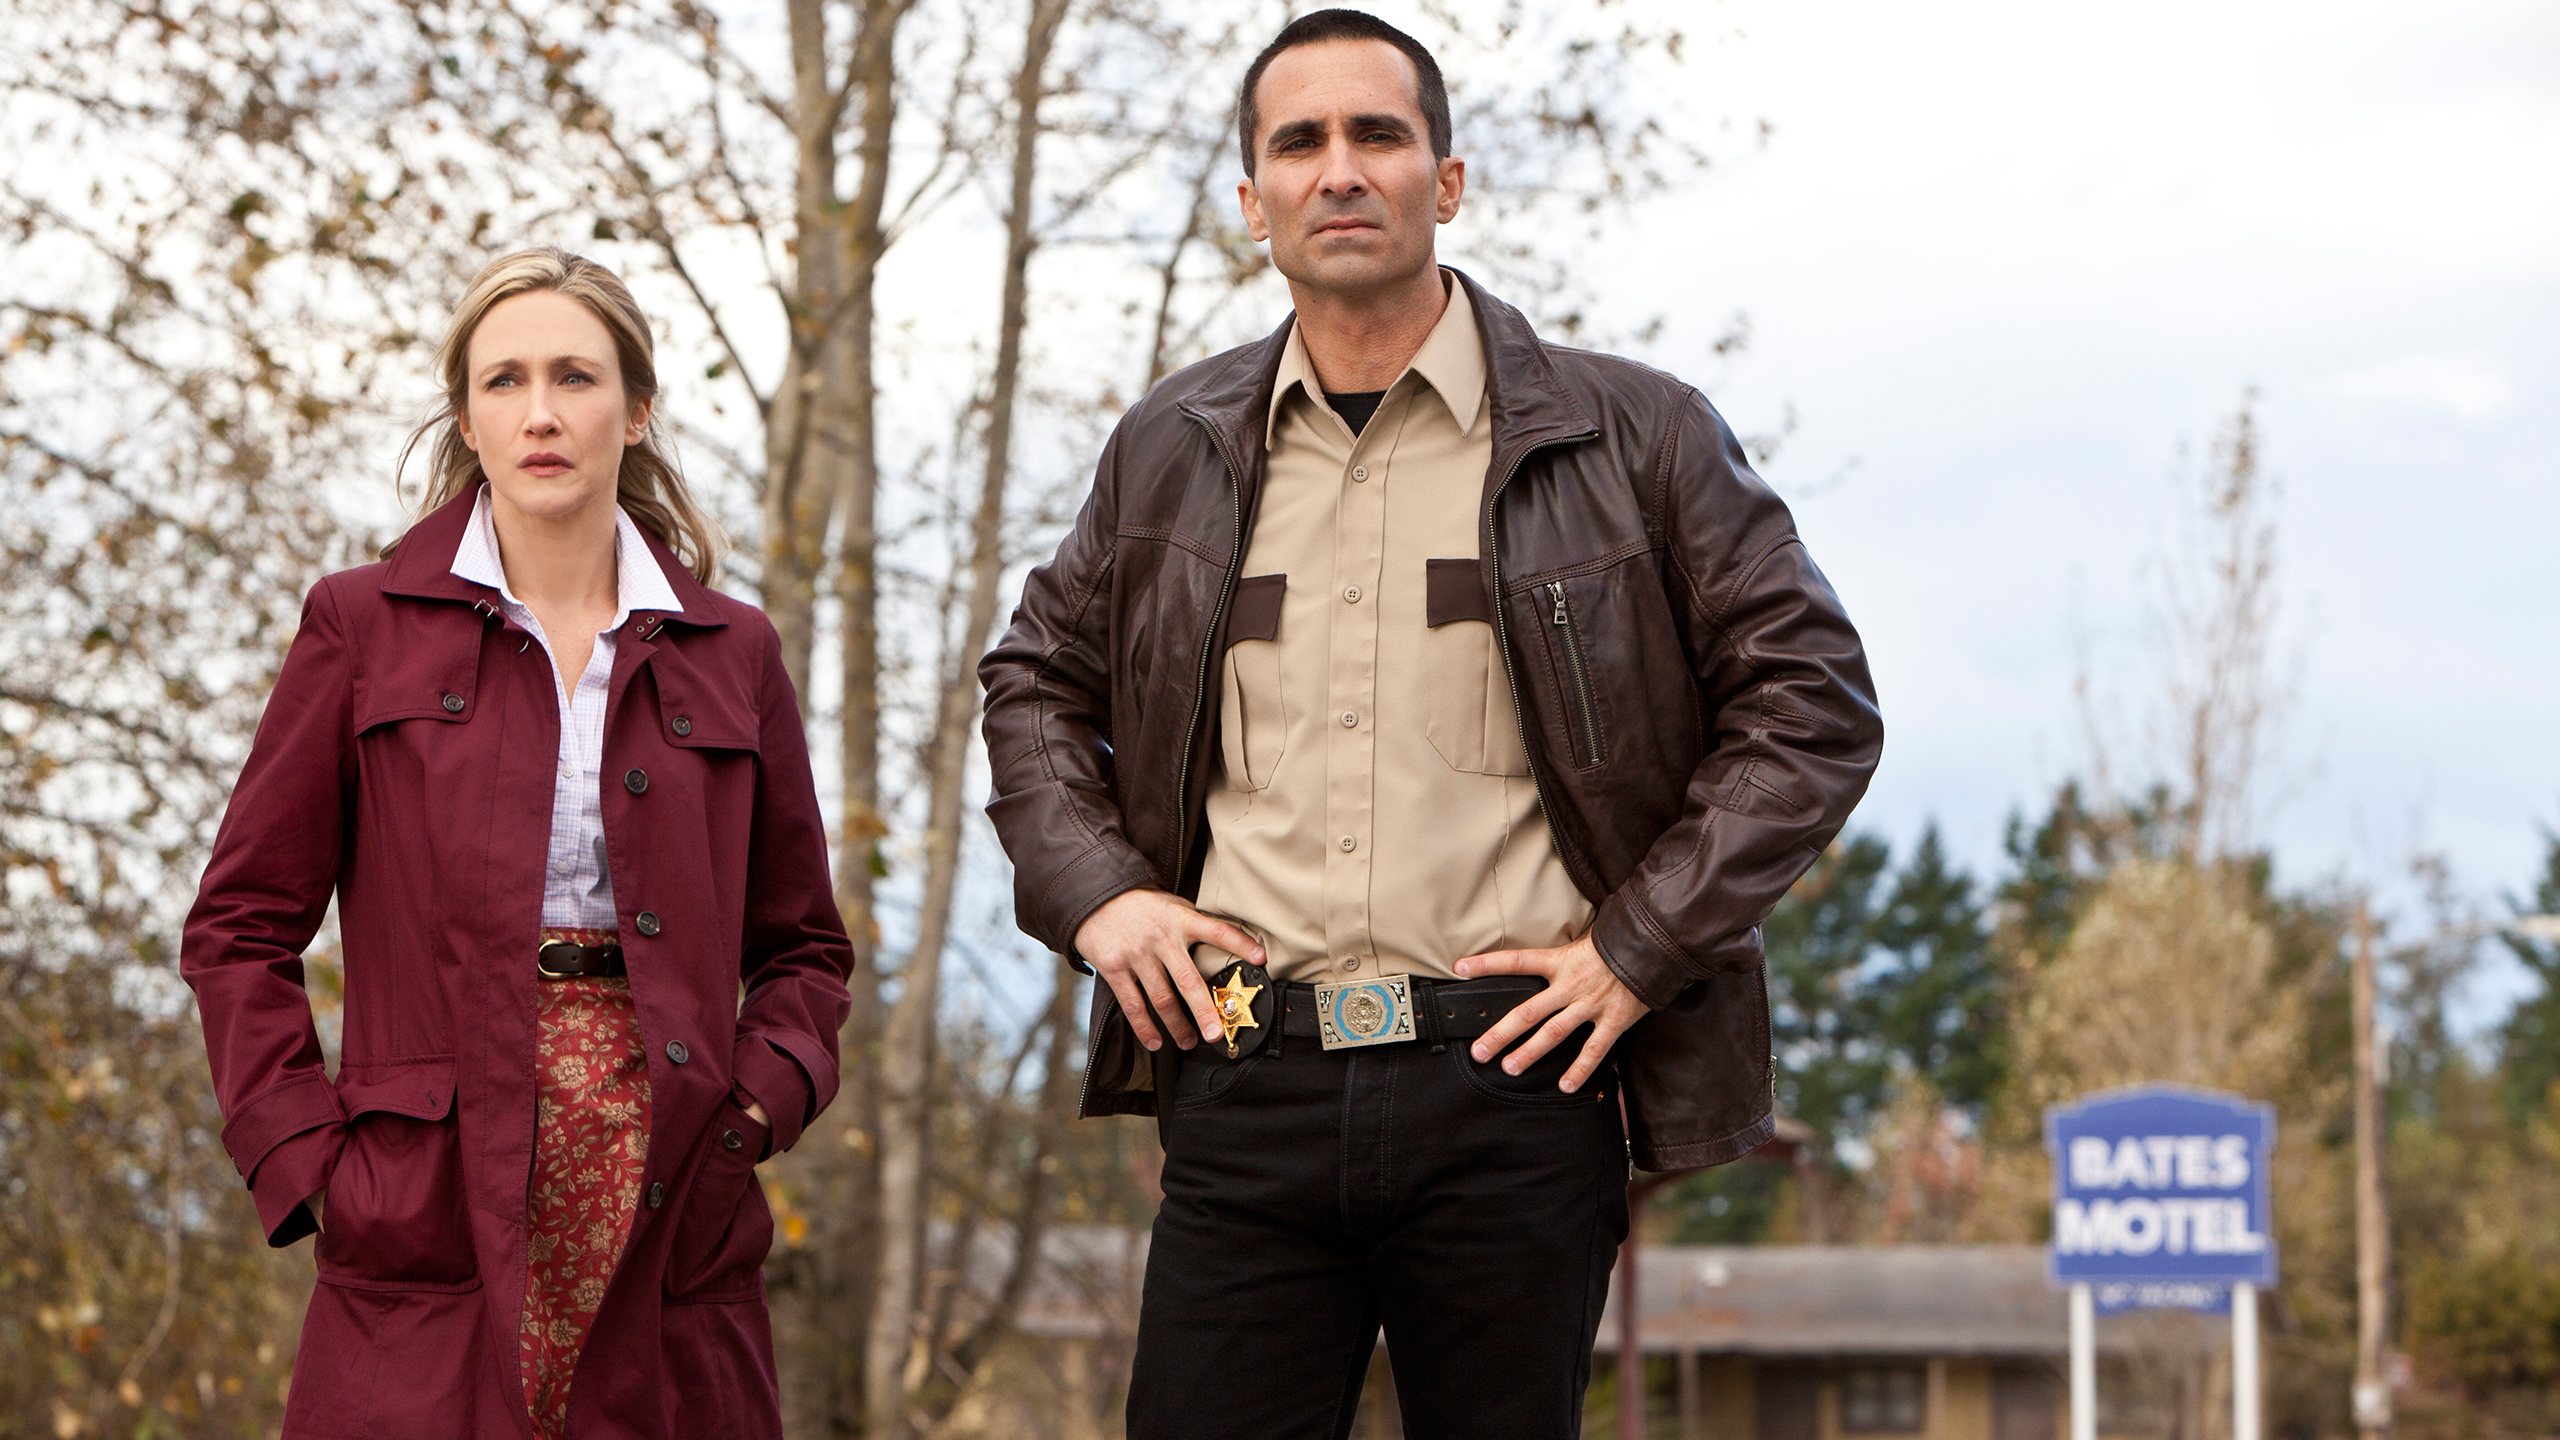 File:05-norma-bates-and-sheriff-romero-outside-the-bates-motel.jpg